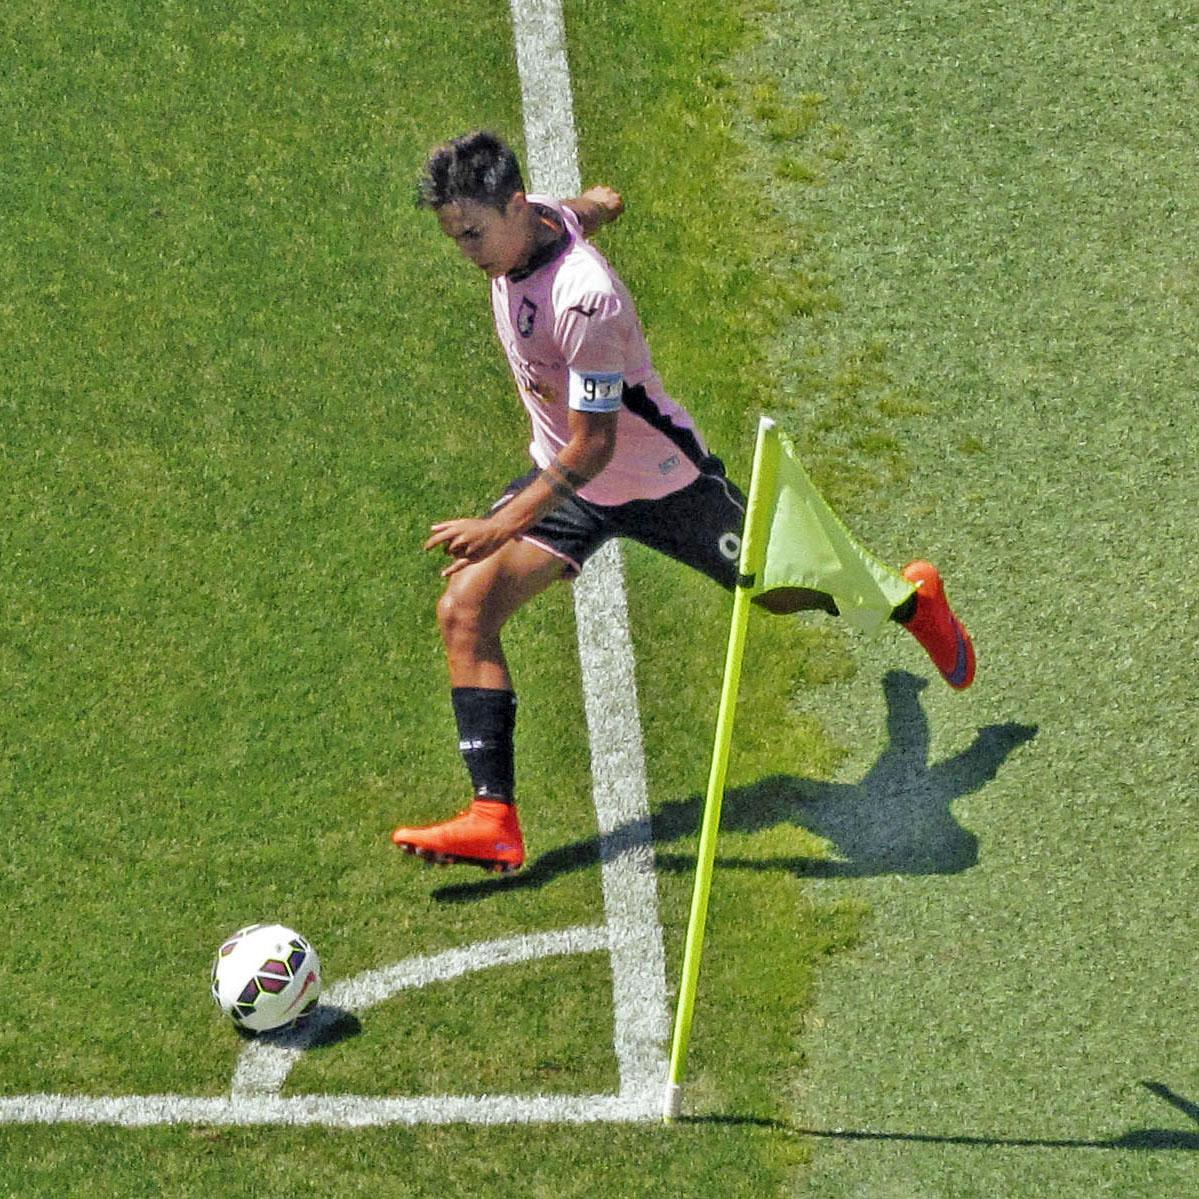 Paulo_Dybala_-_2015_-_US_Citt%C3%A0_di_Palermo_(corner_kick)